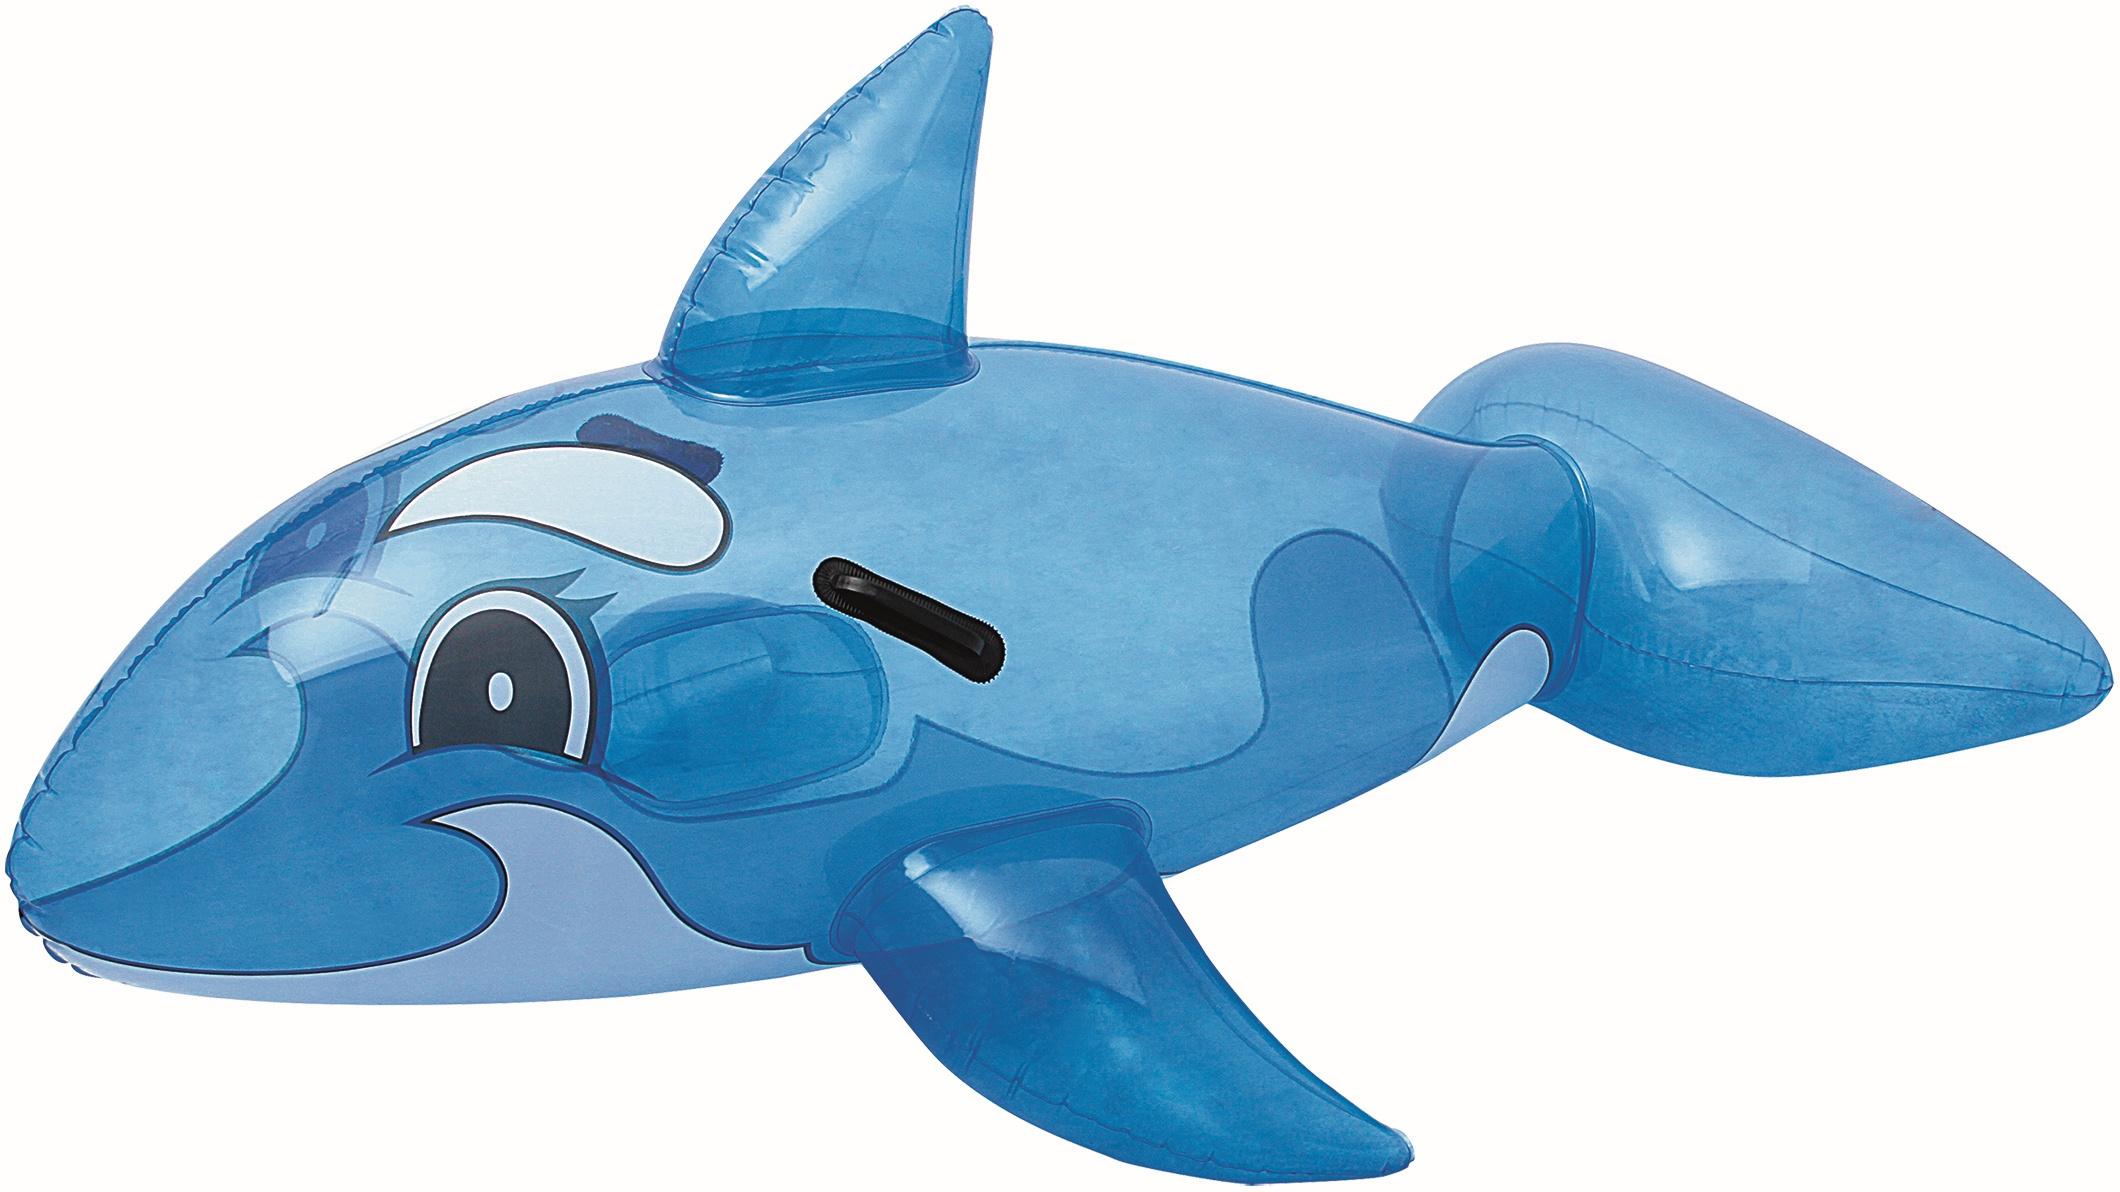 Bestway 41036 delfino gonfiabile gallegiante per piscina for Pesci finti per piscina